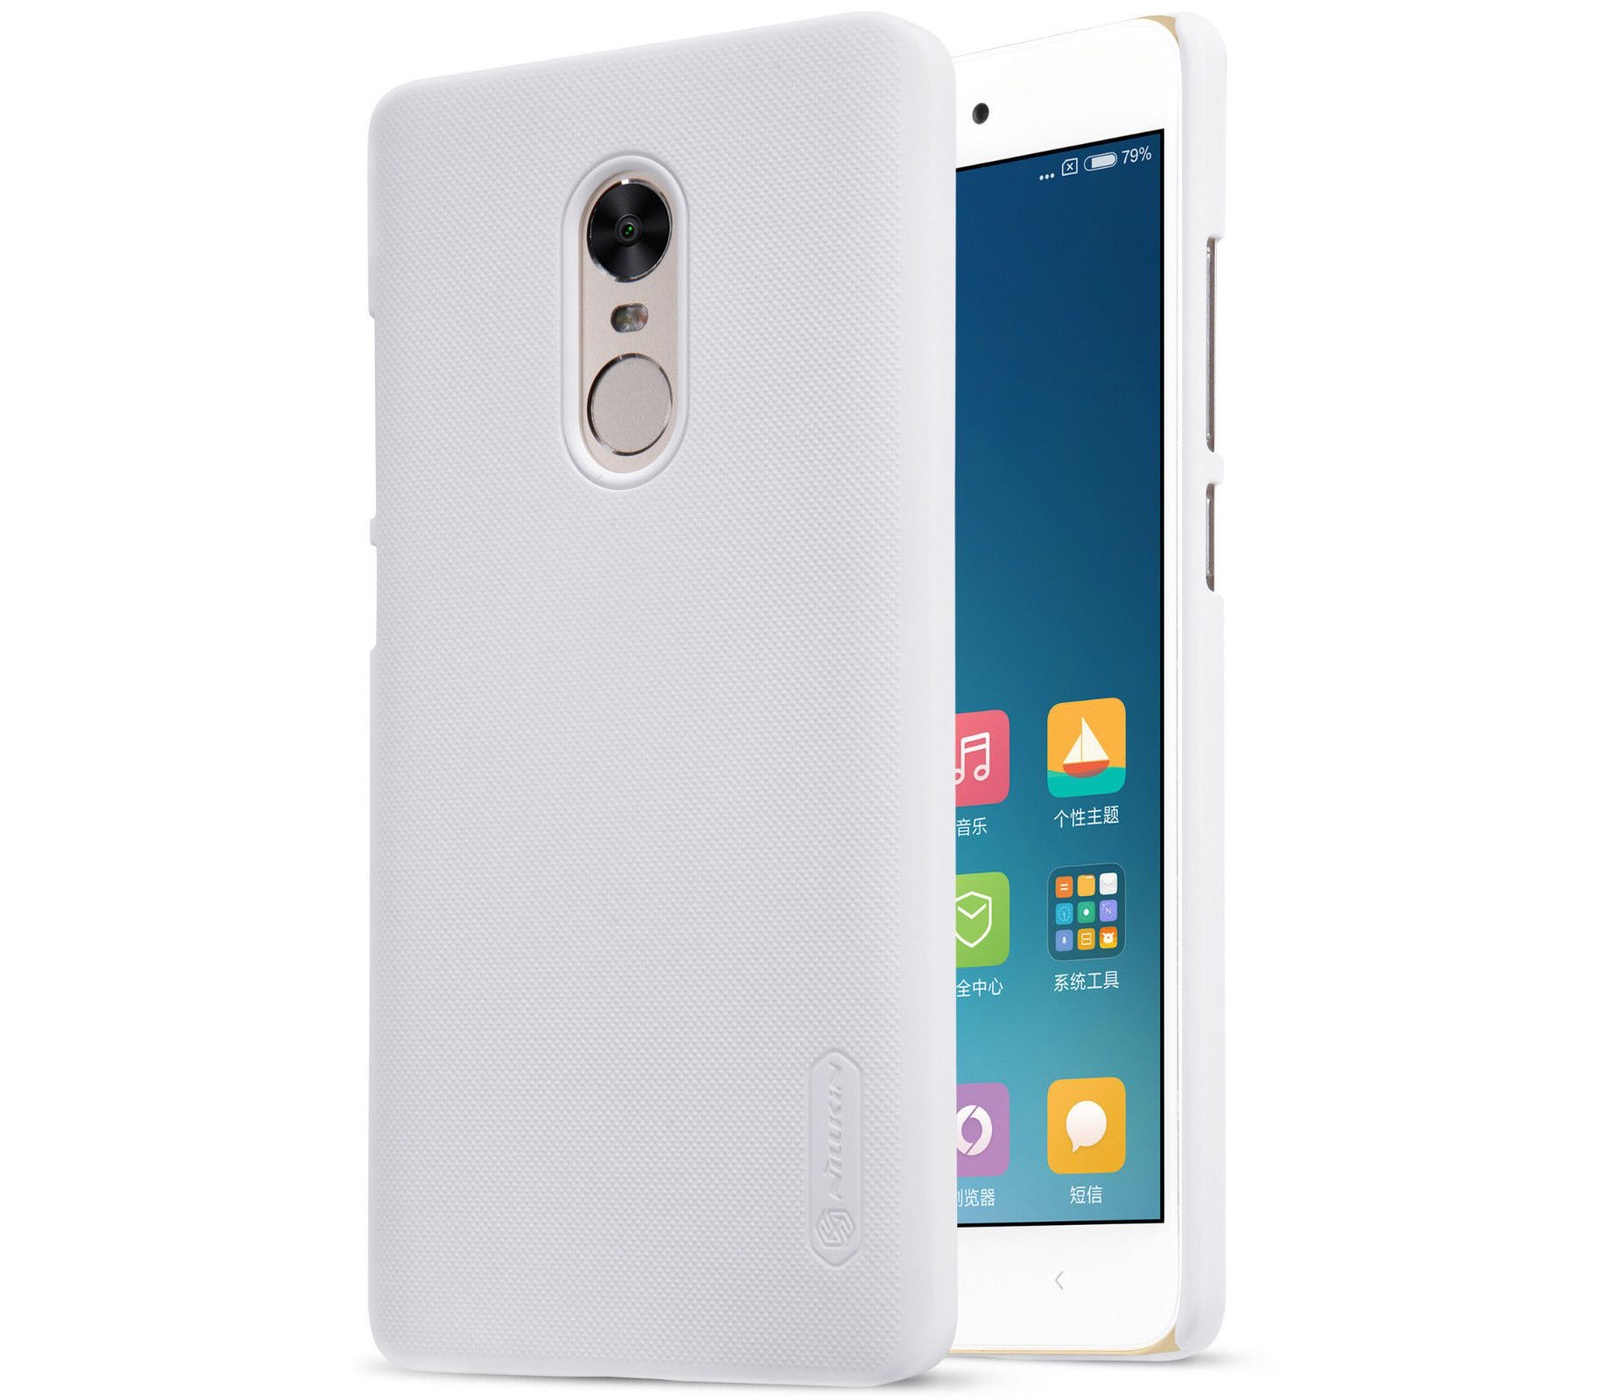 Чехол для сотового телефона Nillkin Накладка Frosted Xiaomi Redmi Note 4 White, белый чехол для сотового телефона nillkin накладка frosted xiaomi redmi 4a black черный